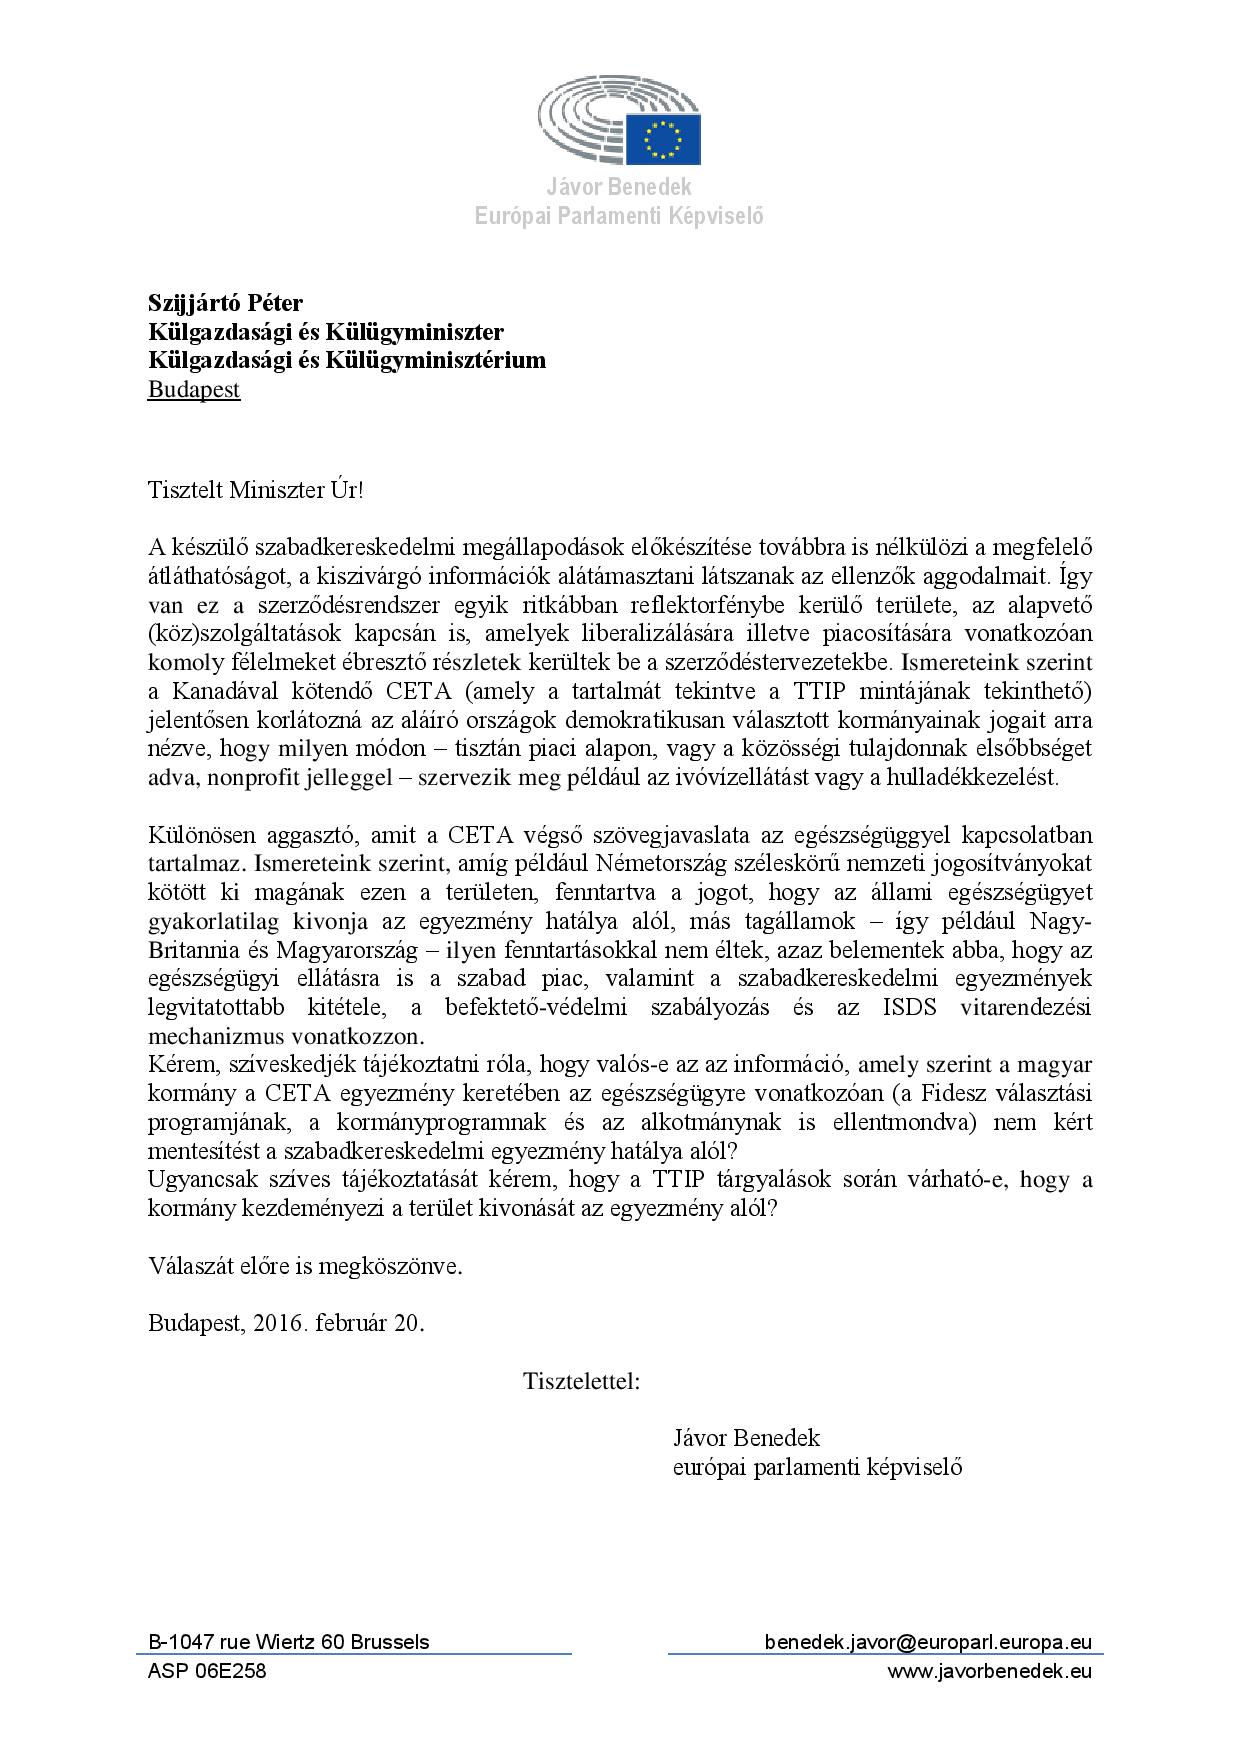 ttip-ceta_nyiltlevel-page-001.jpg